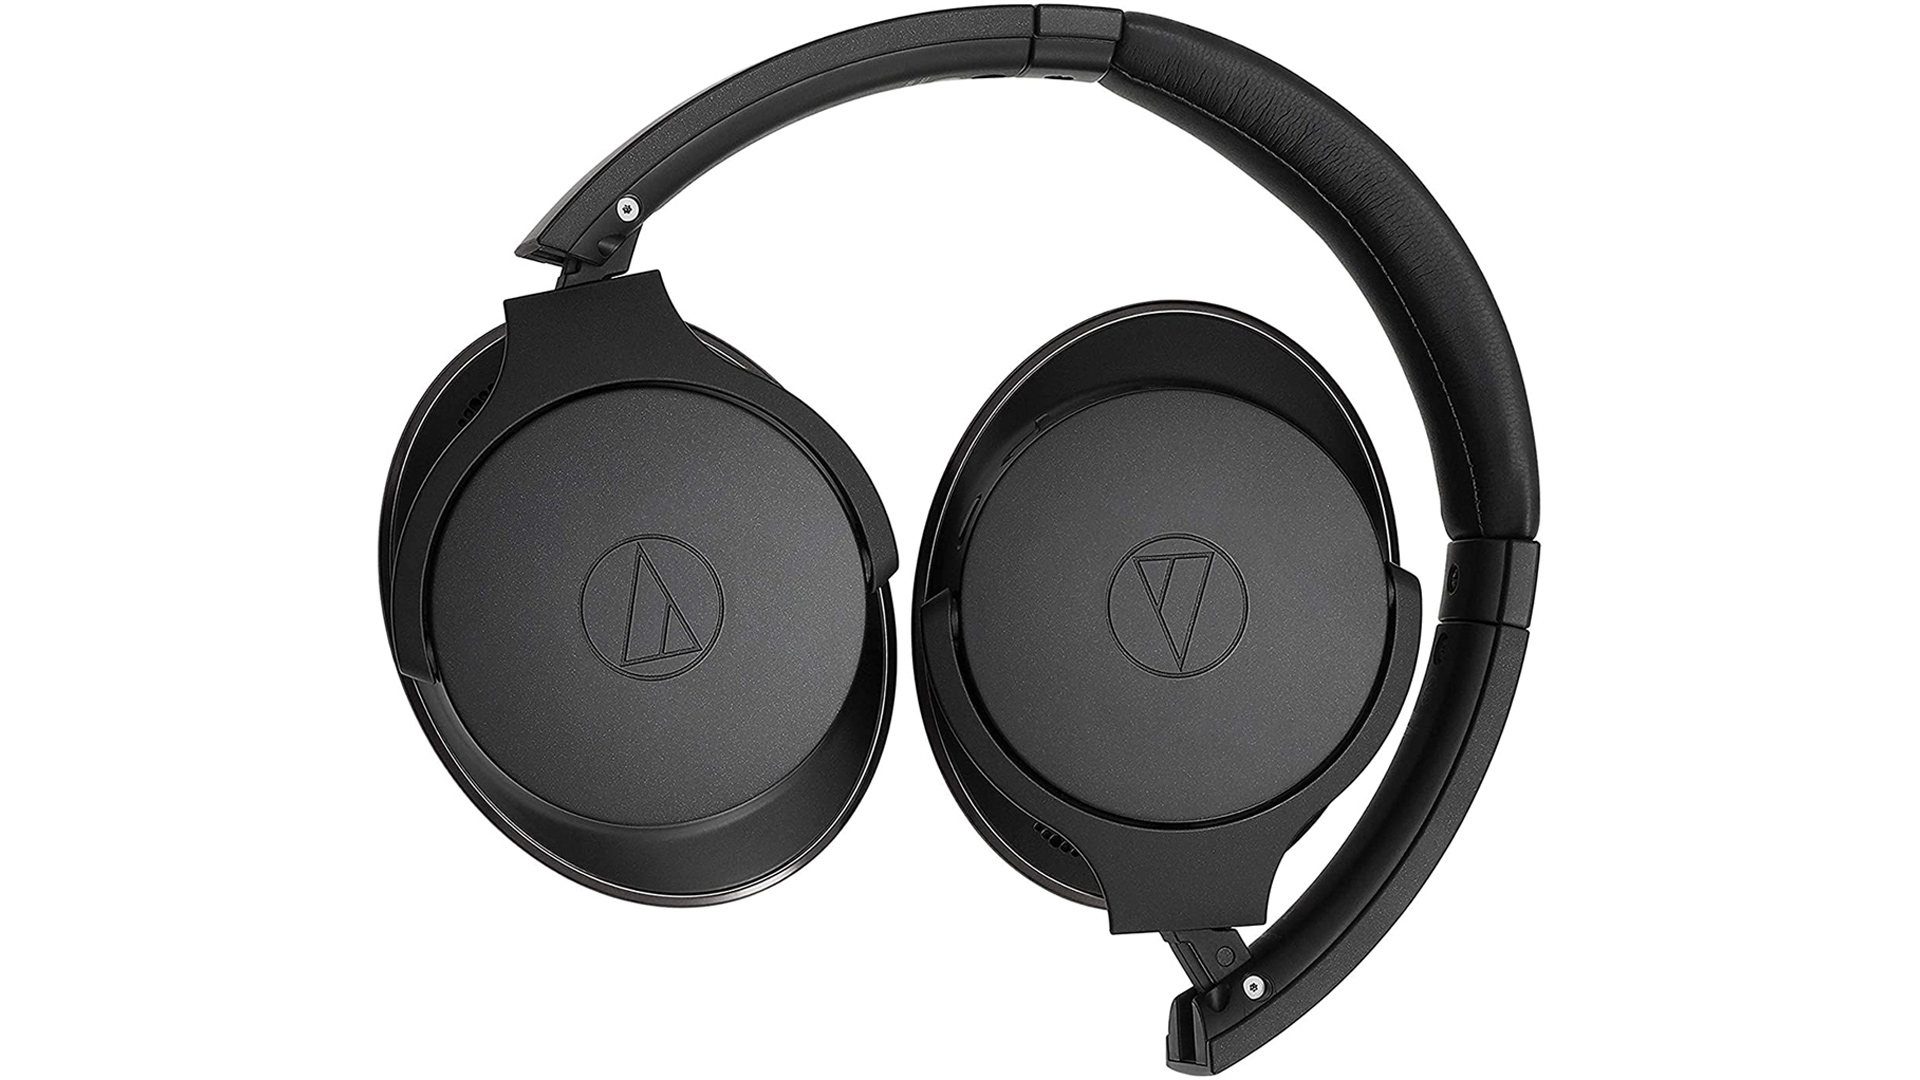 Audio-Technica ATH-ANC900BT QuietPoint Wireless Headphones